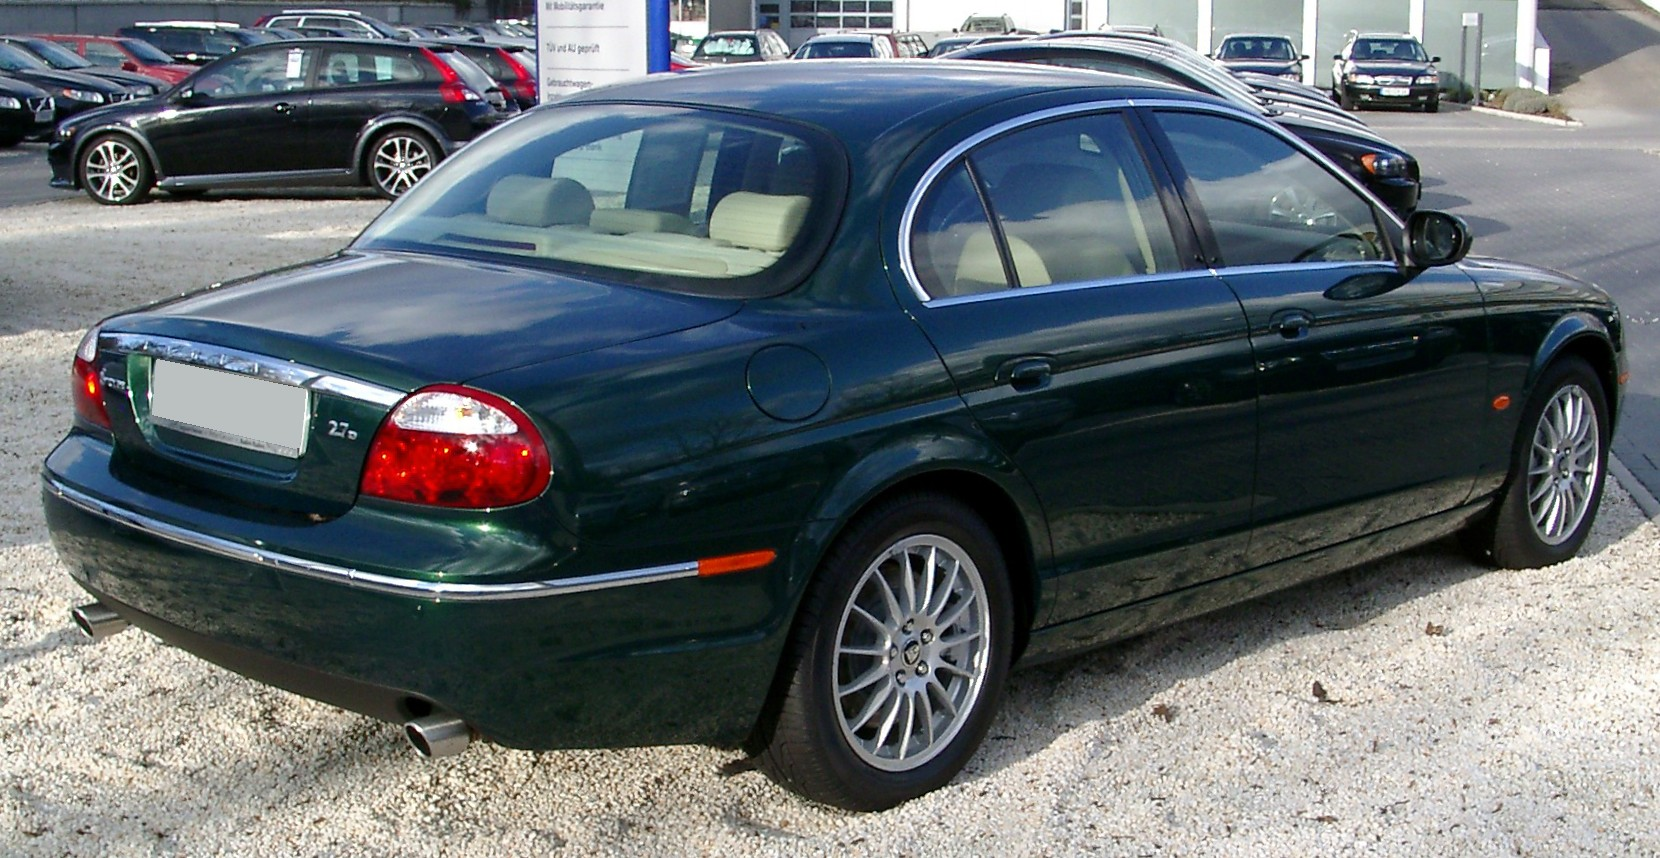 File:Jaguar S Type Rear 20080202